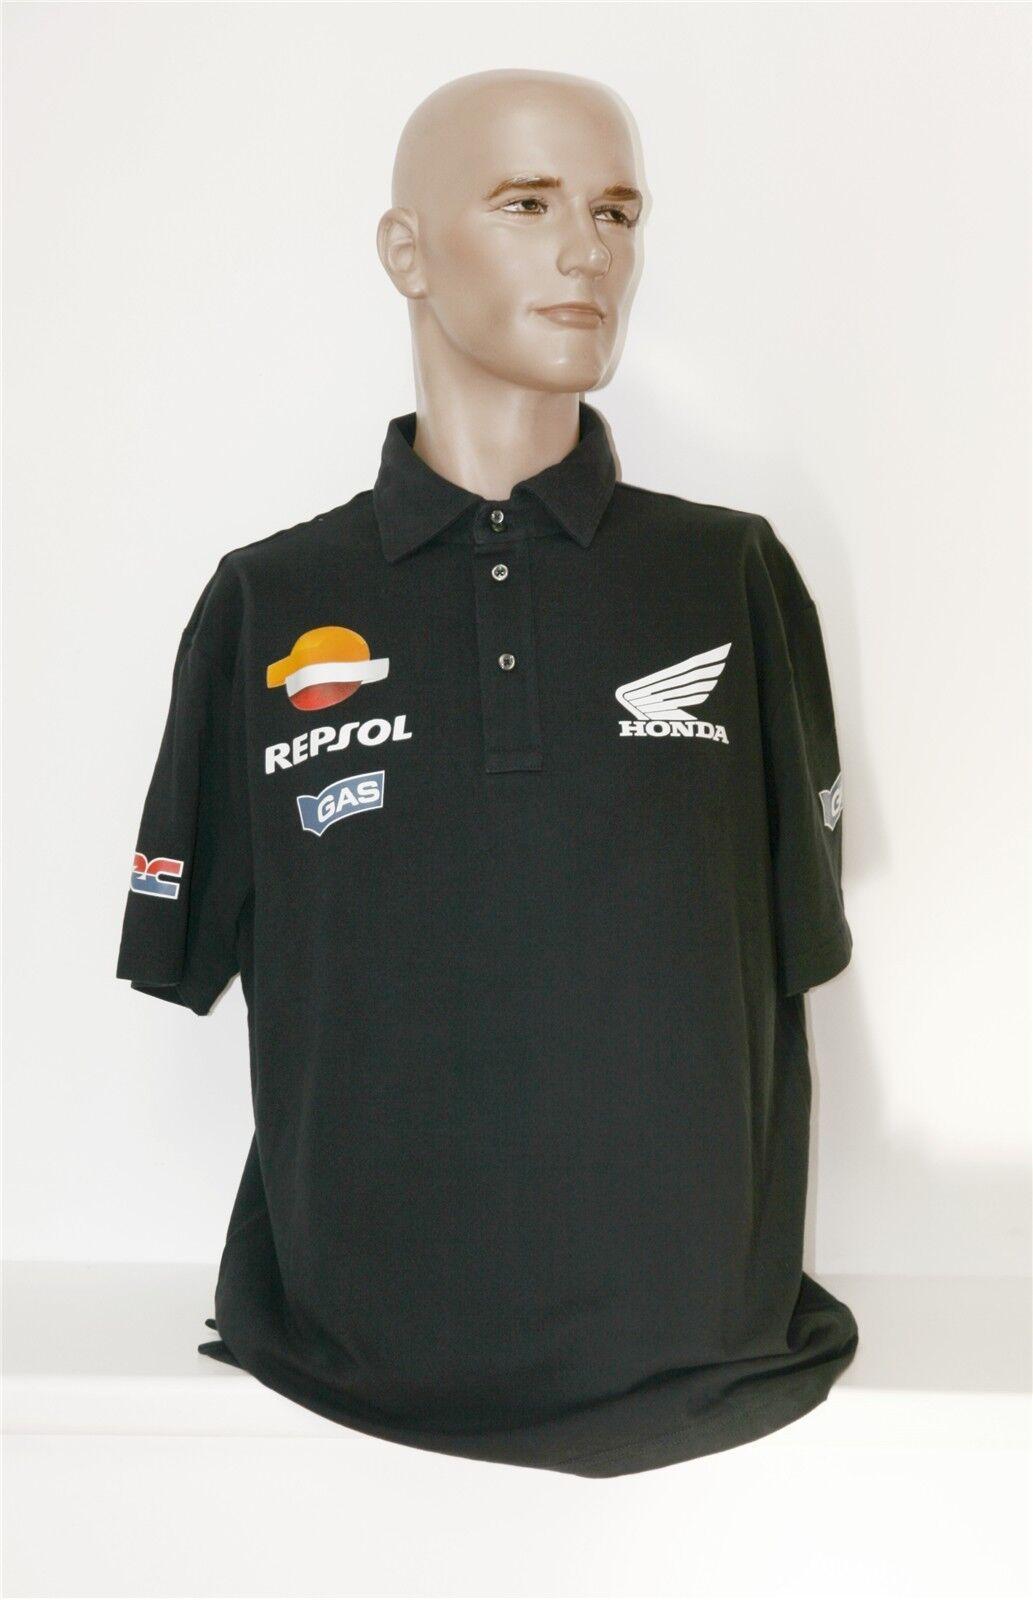 Honda Repsol Herren Gas Poloshirt Gr. XXXXL schwarz